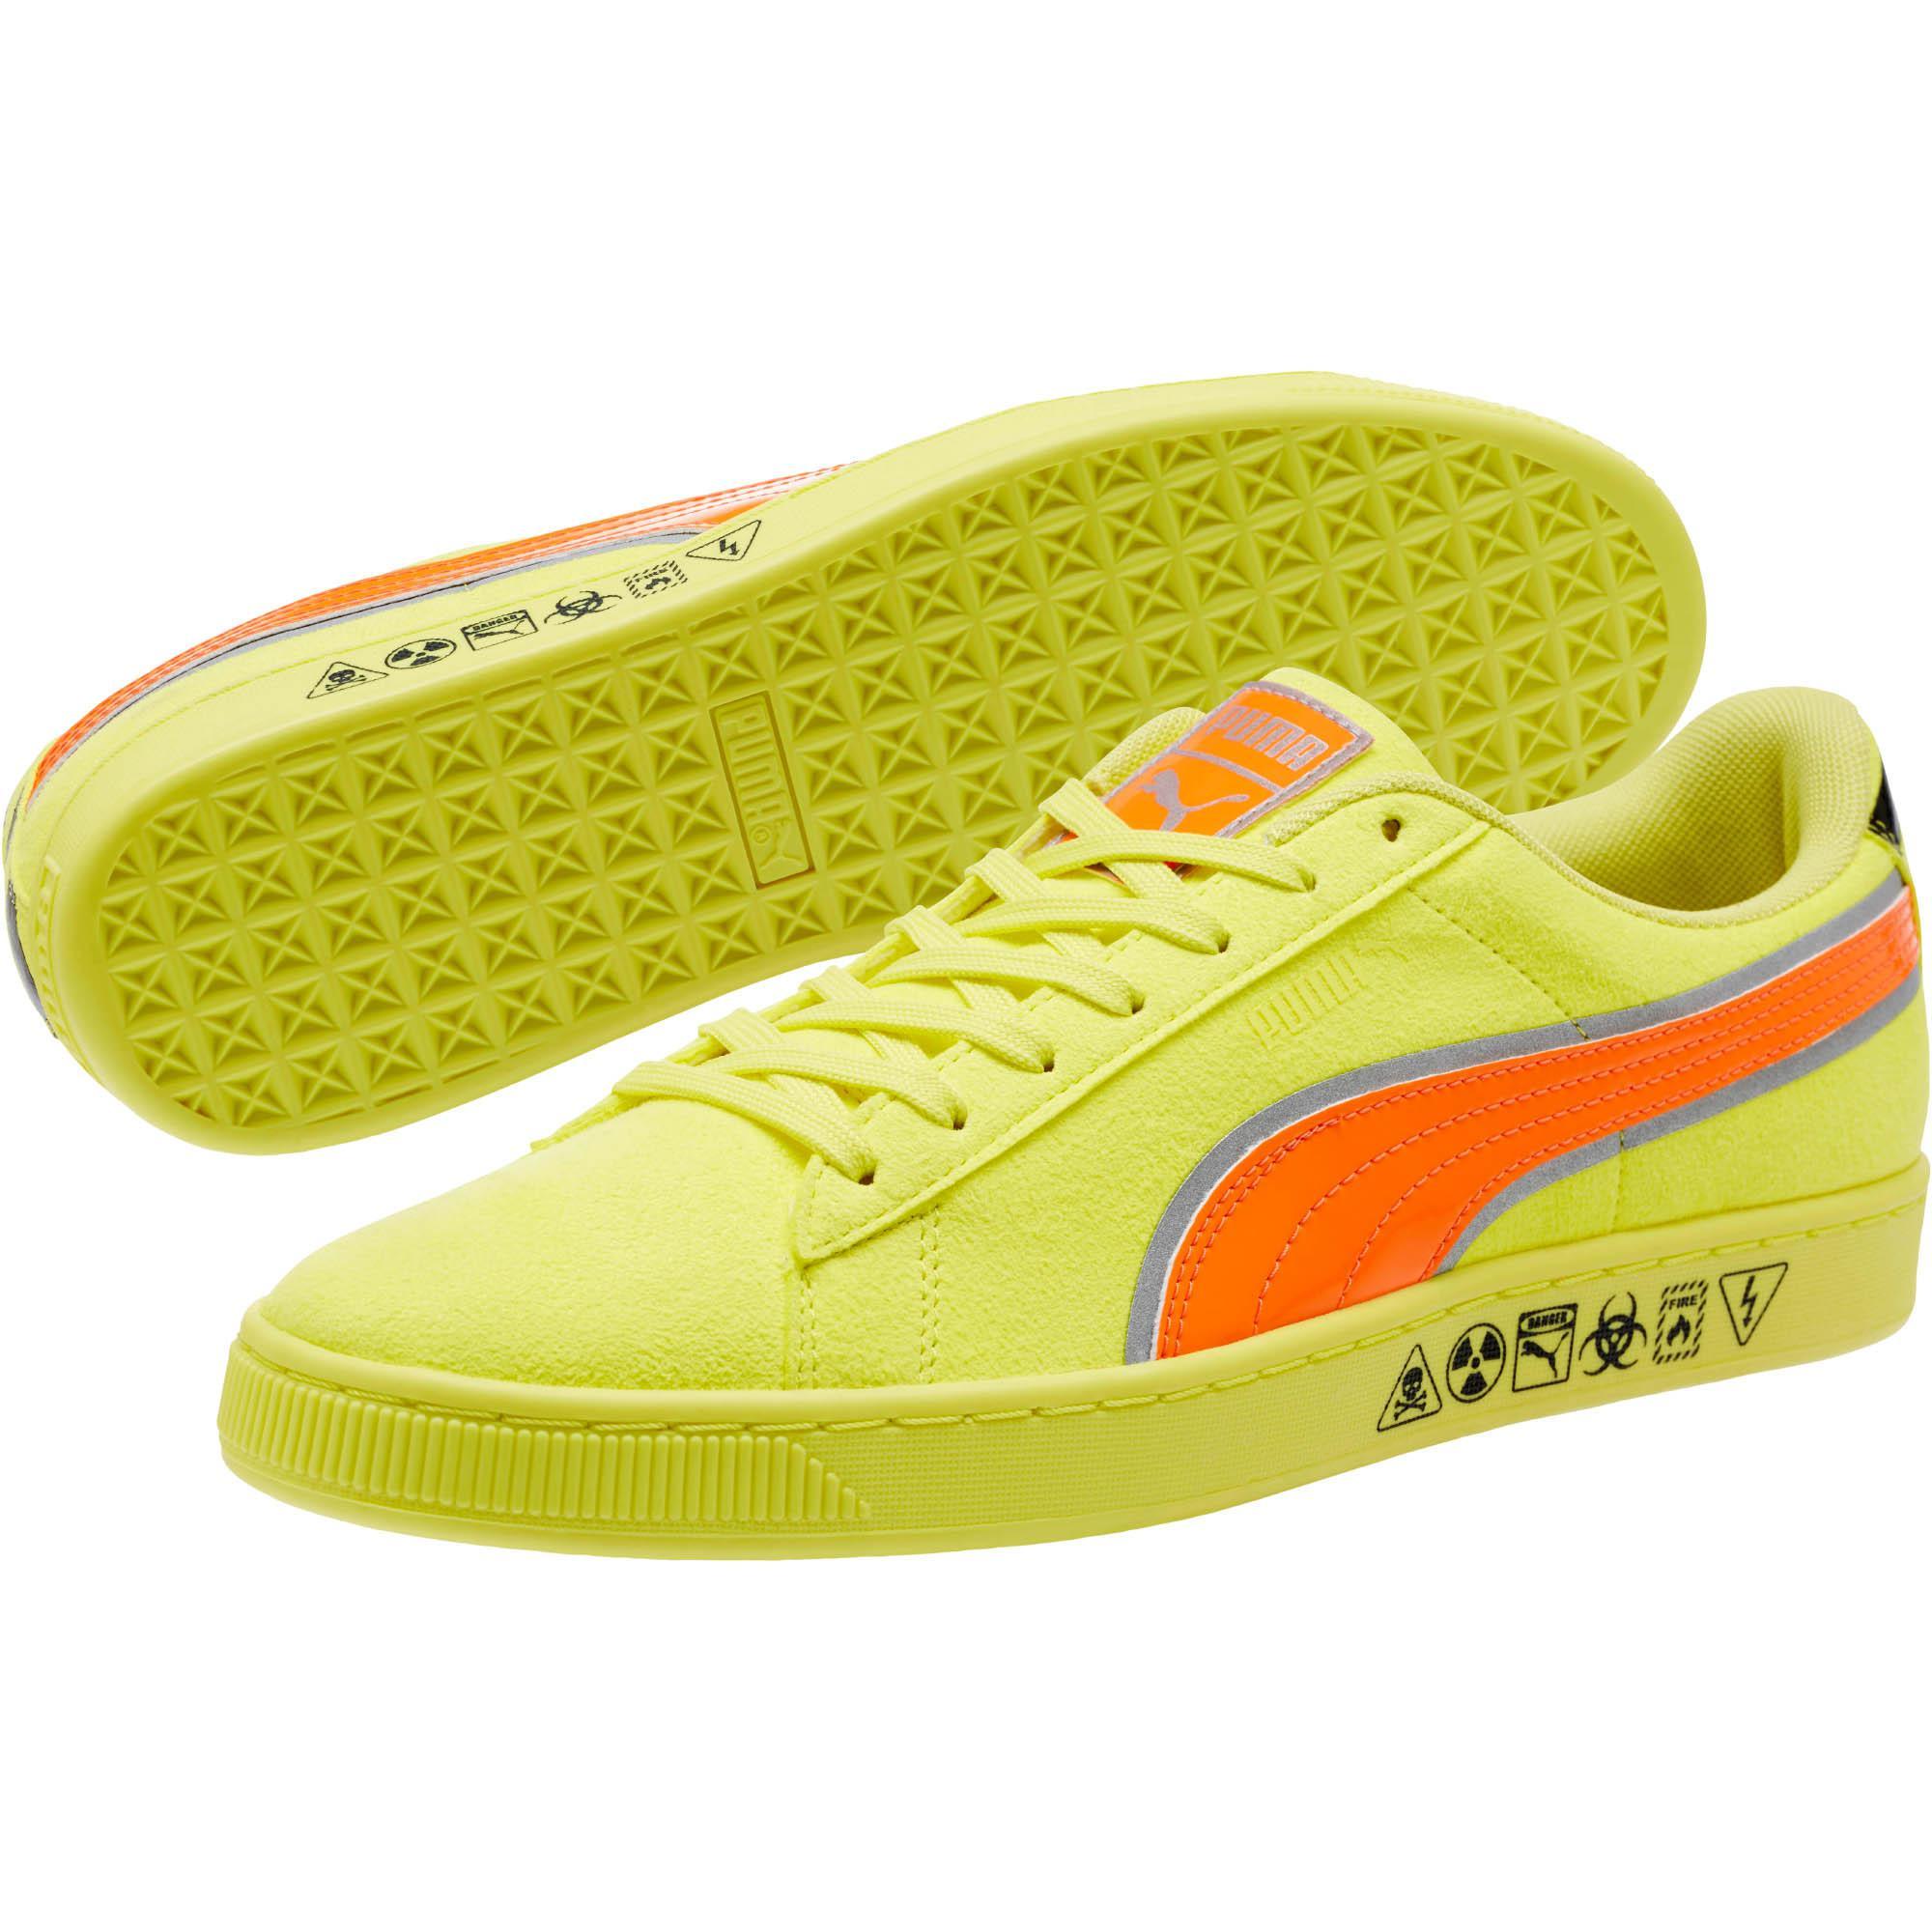 9406d6c2d5fd8 Lyst - PUMA Hazard Yellow Suede Sneakers in Yellow for Men